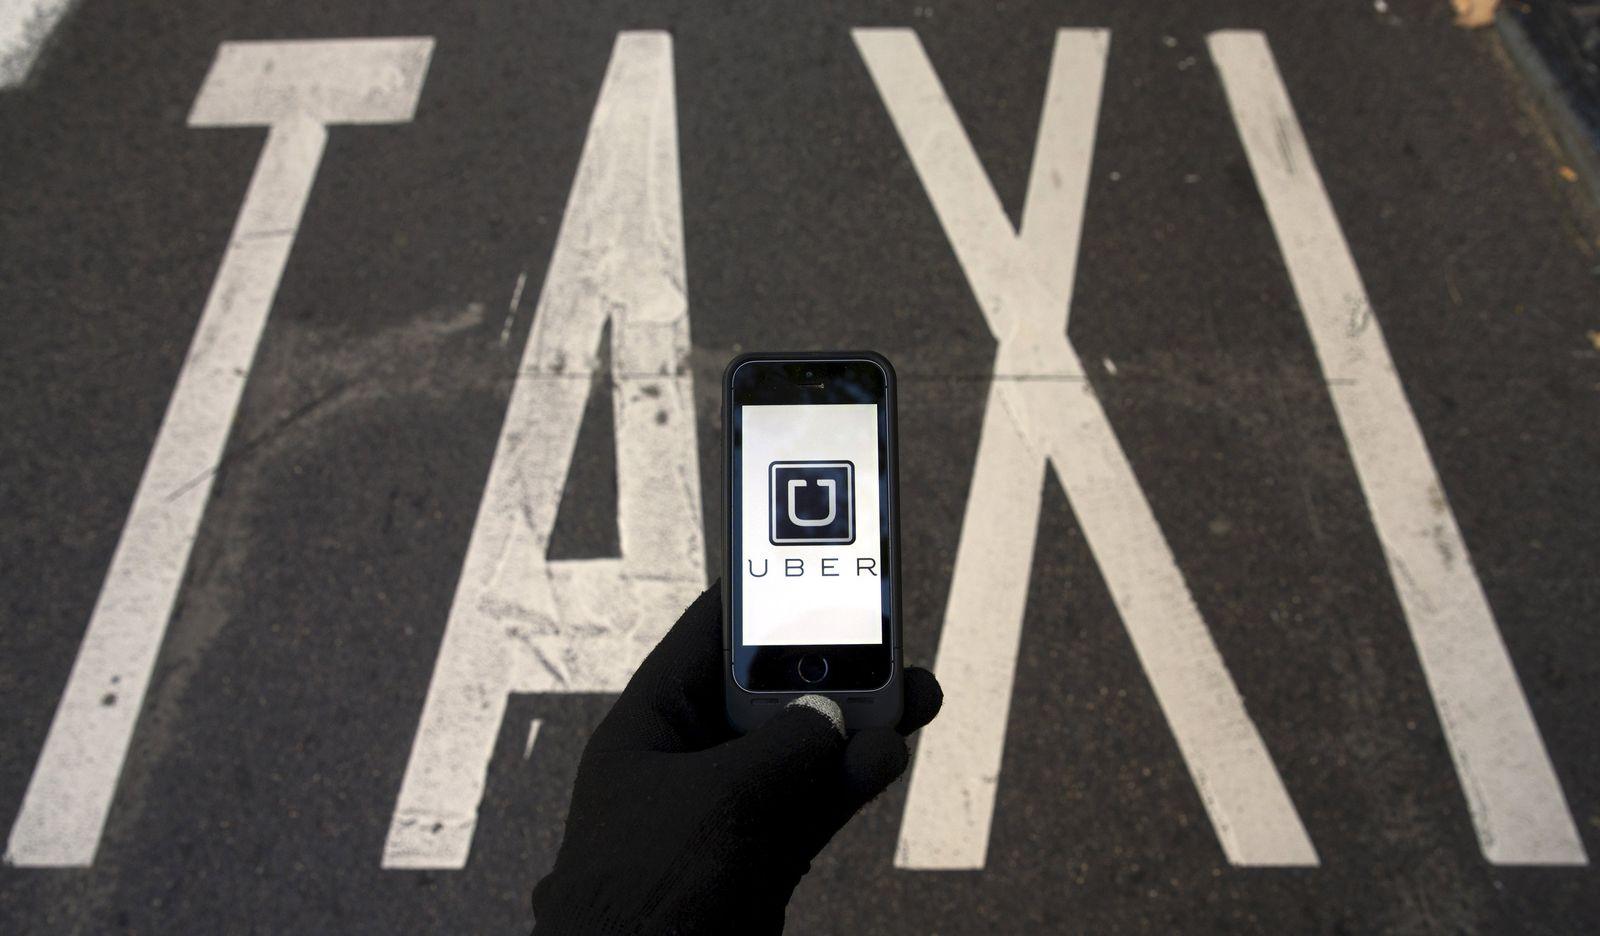 Uber / Taxi / Symbolbild